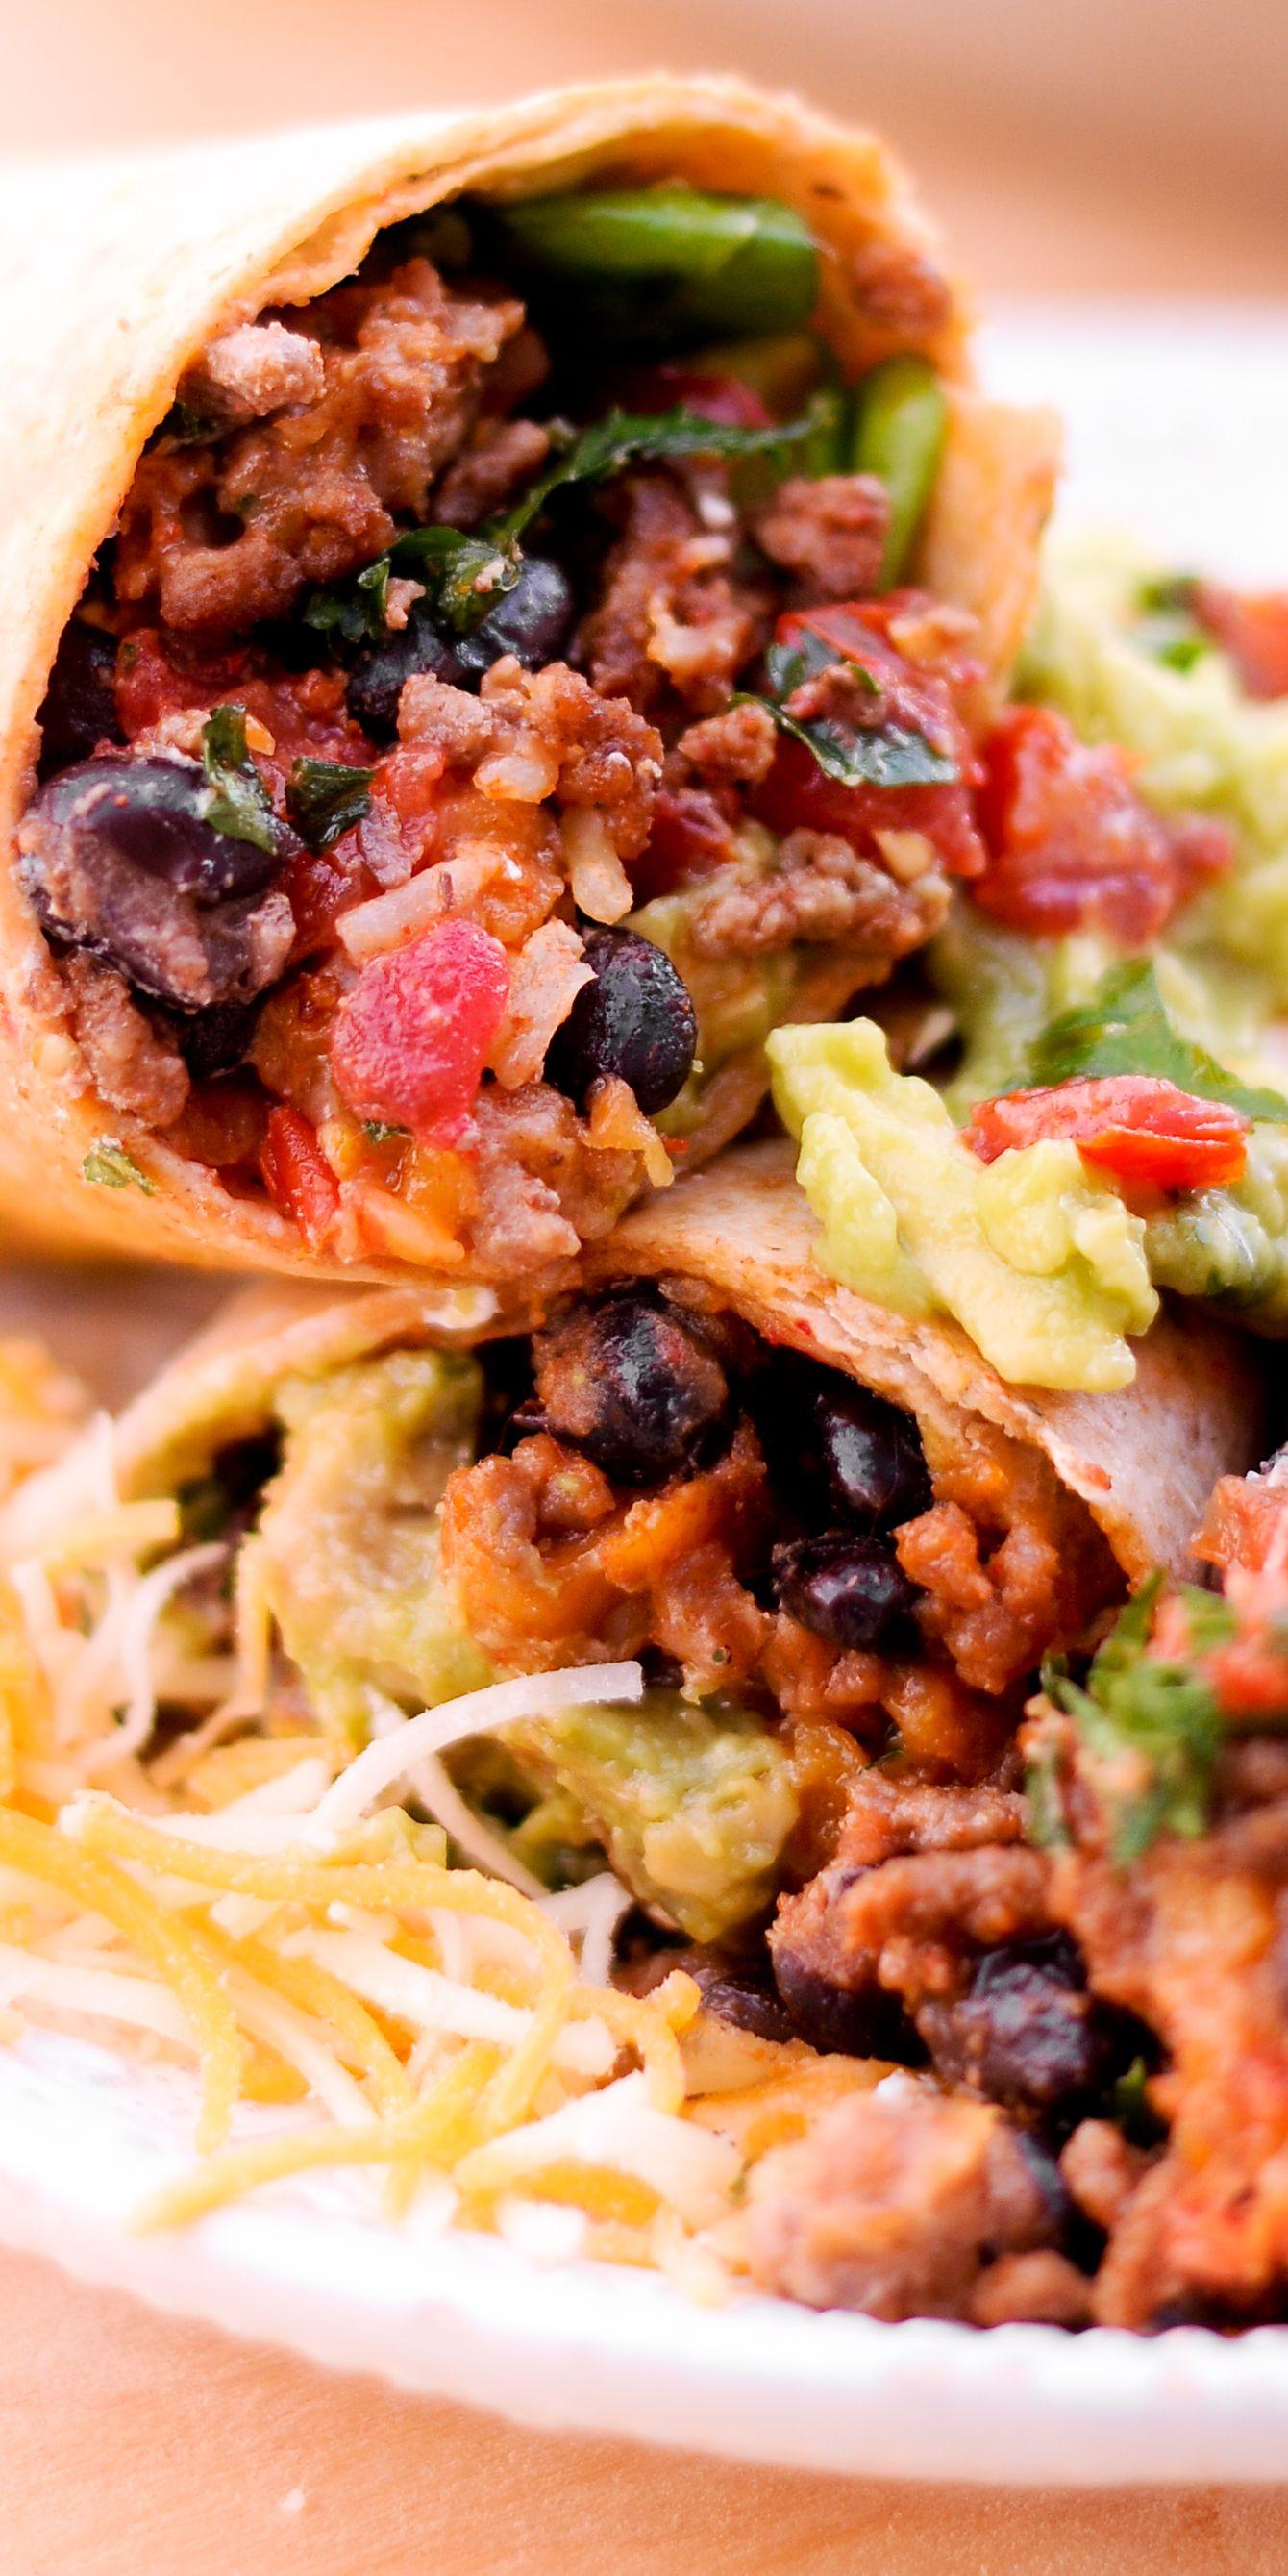 Beef Burrito With Guacamole In 2020 Beef Burrito Recipe Beef Burrito Recipe Easy Ground Beef